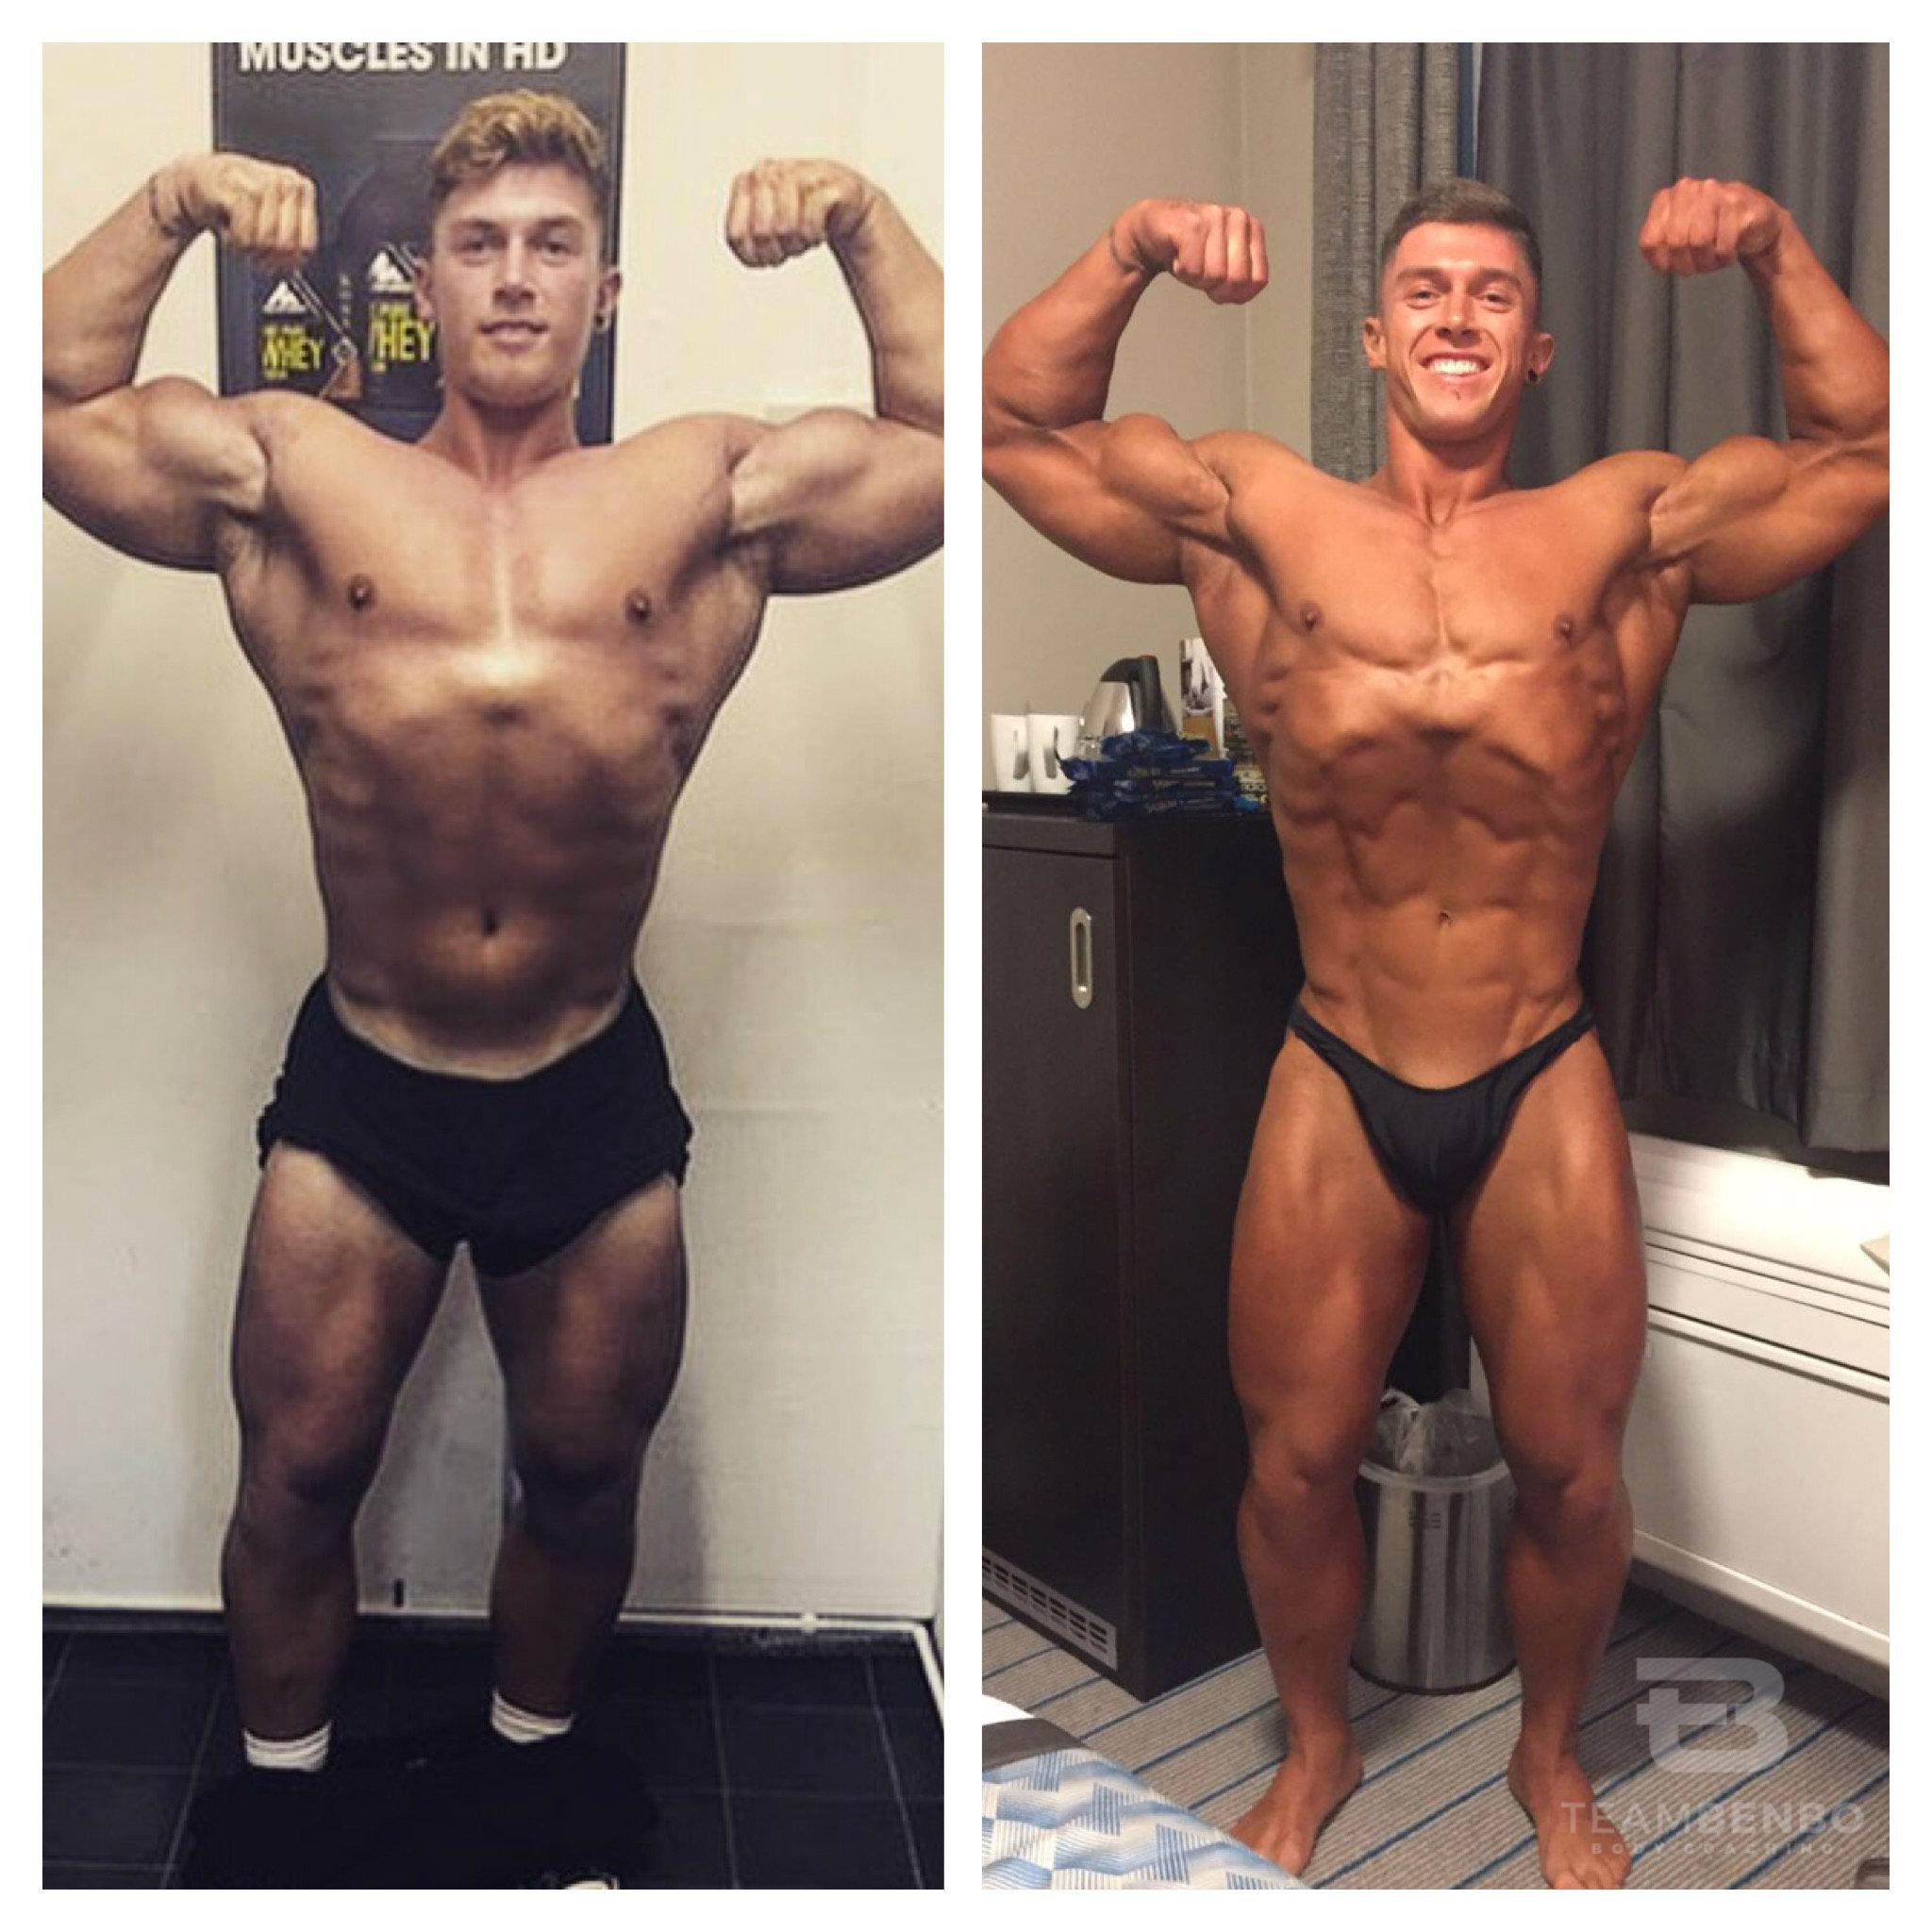 Carl transformation